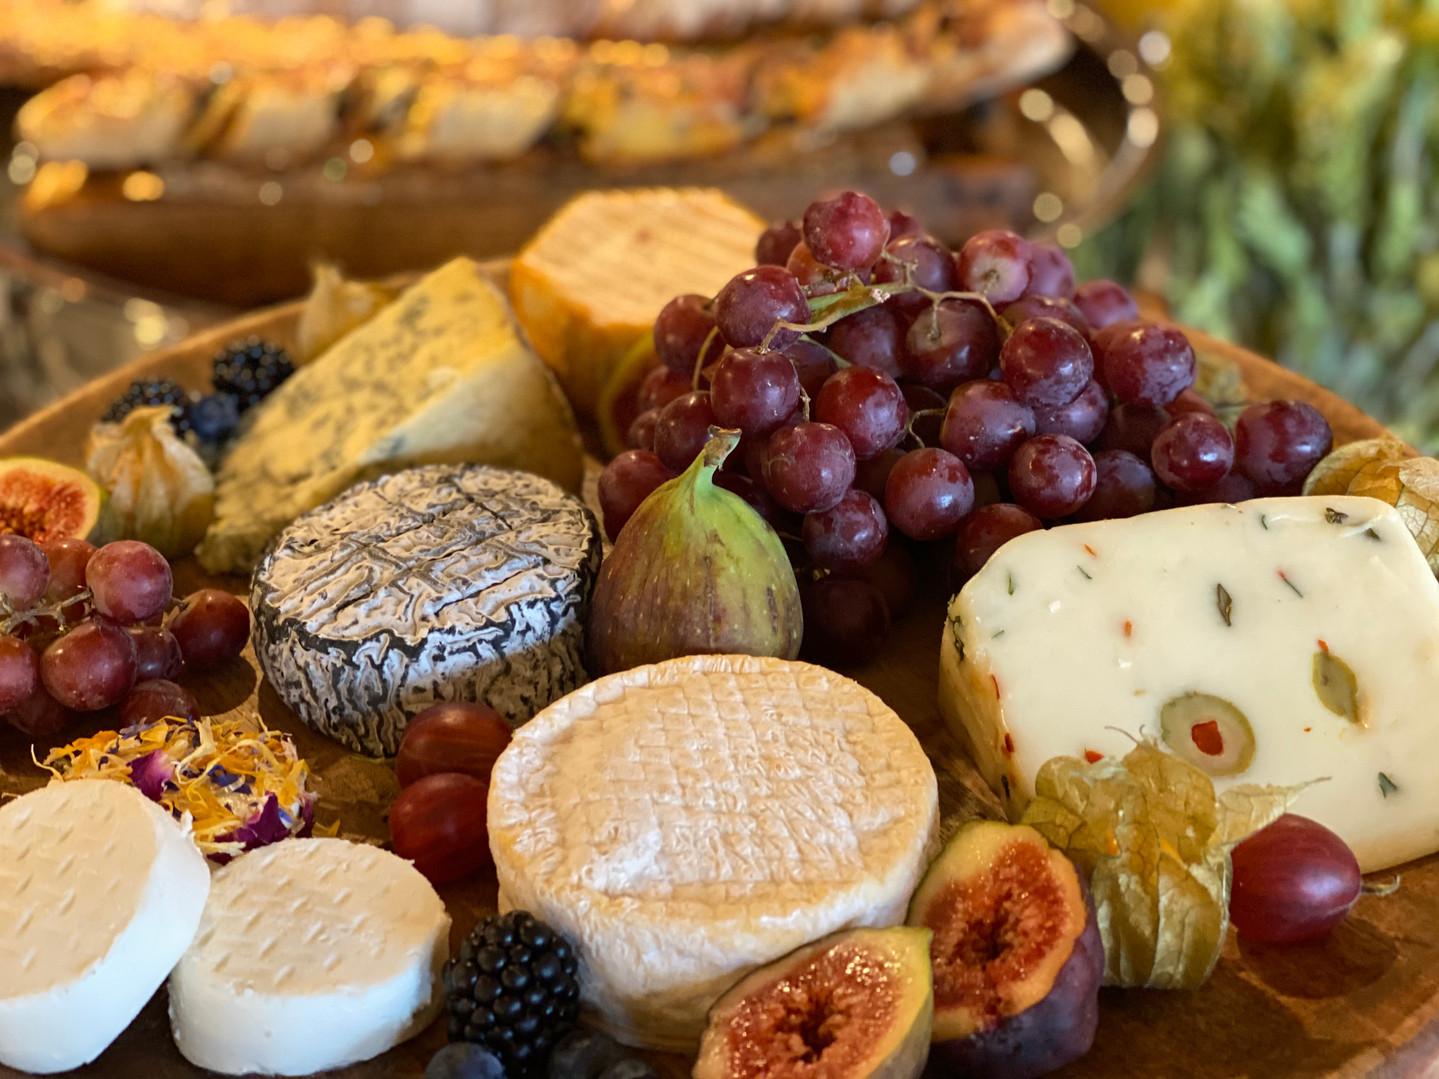 Käseplatte Lunch & Sweet im Hotel Wegner - the culinary art hotel